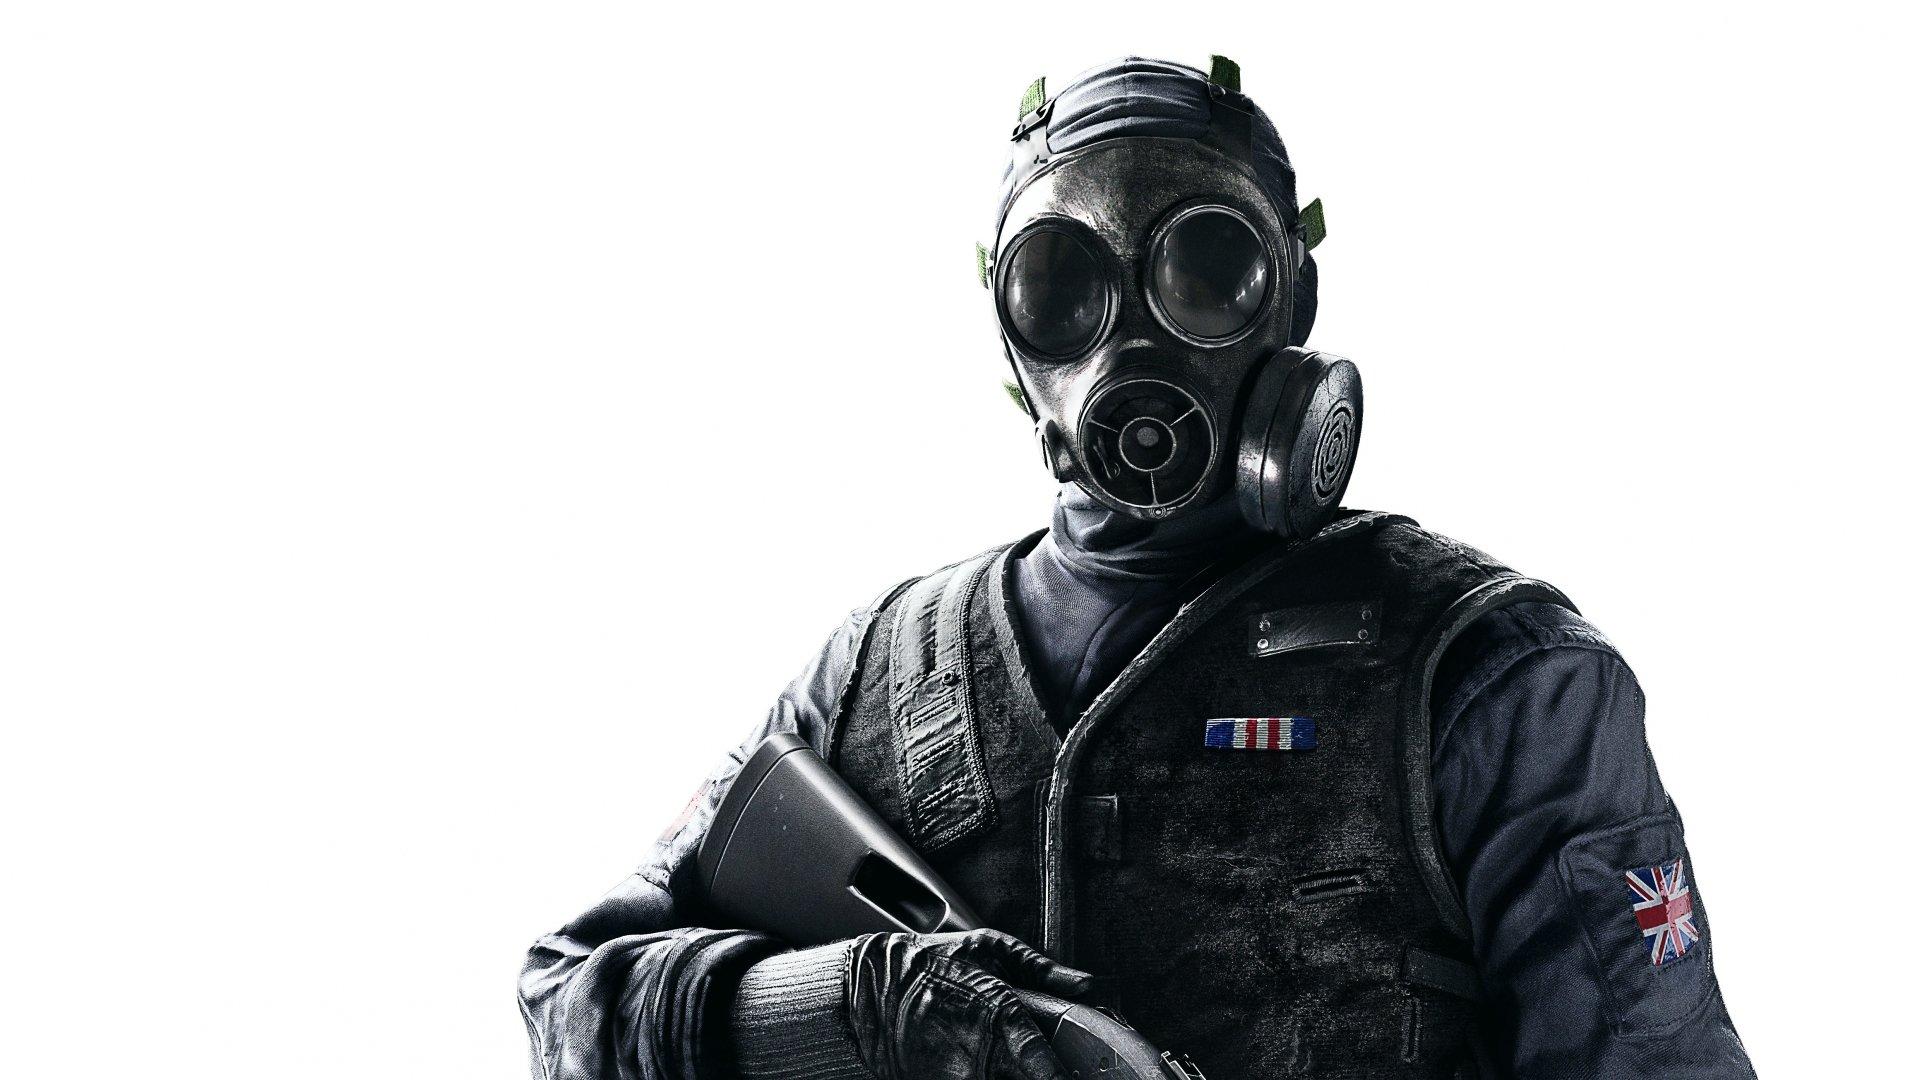 Video Game - Tom Clancy's Rainbow Six: Siege  Gas Mask Wallpaper